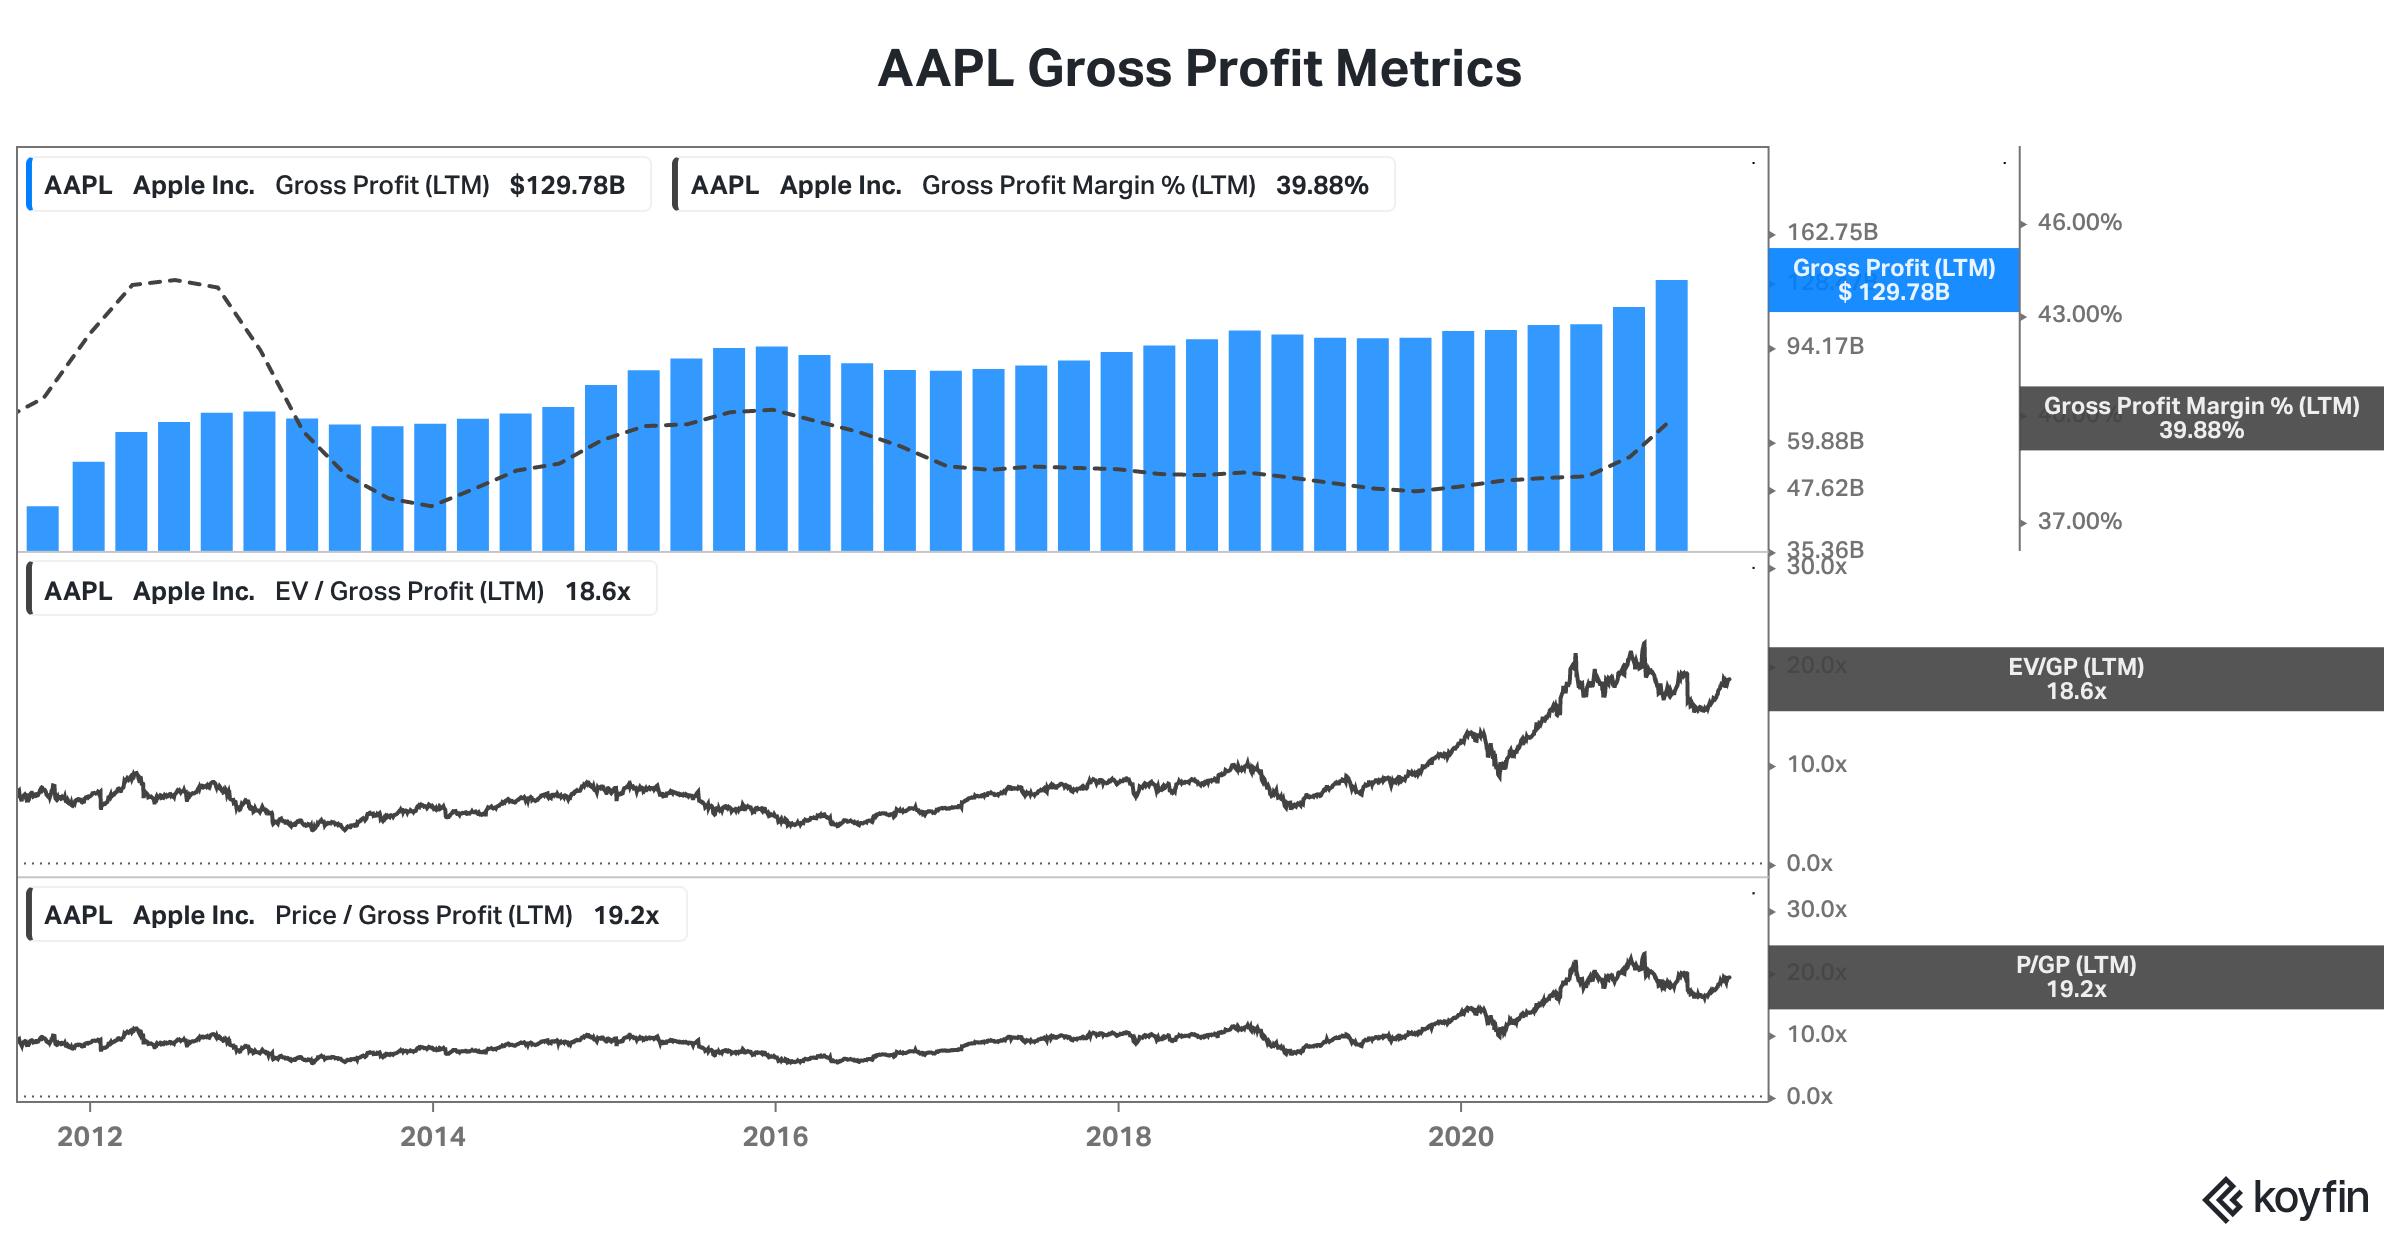 Koyfin debt metrics view